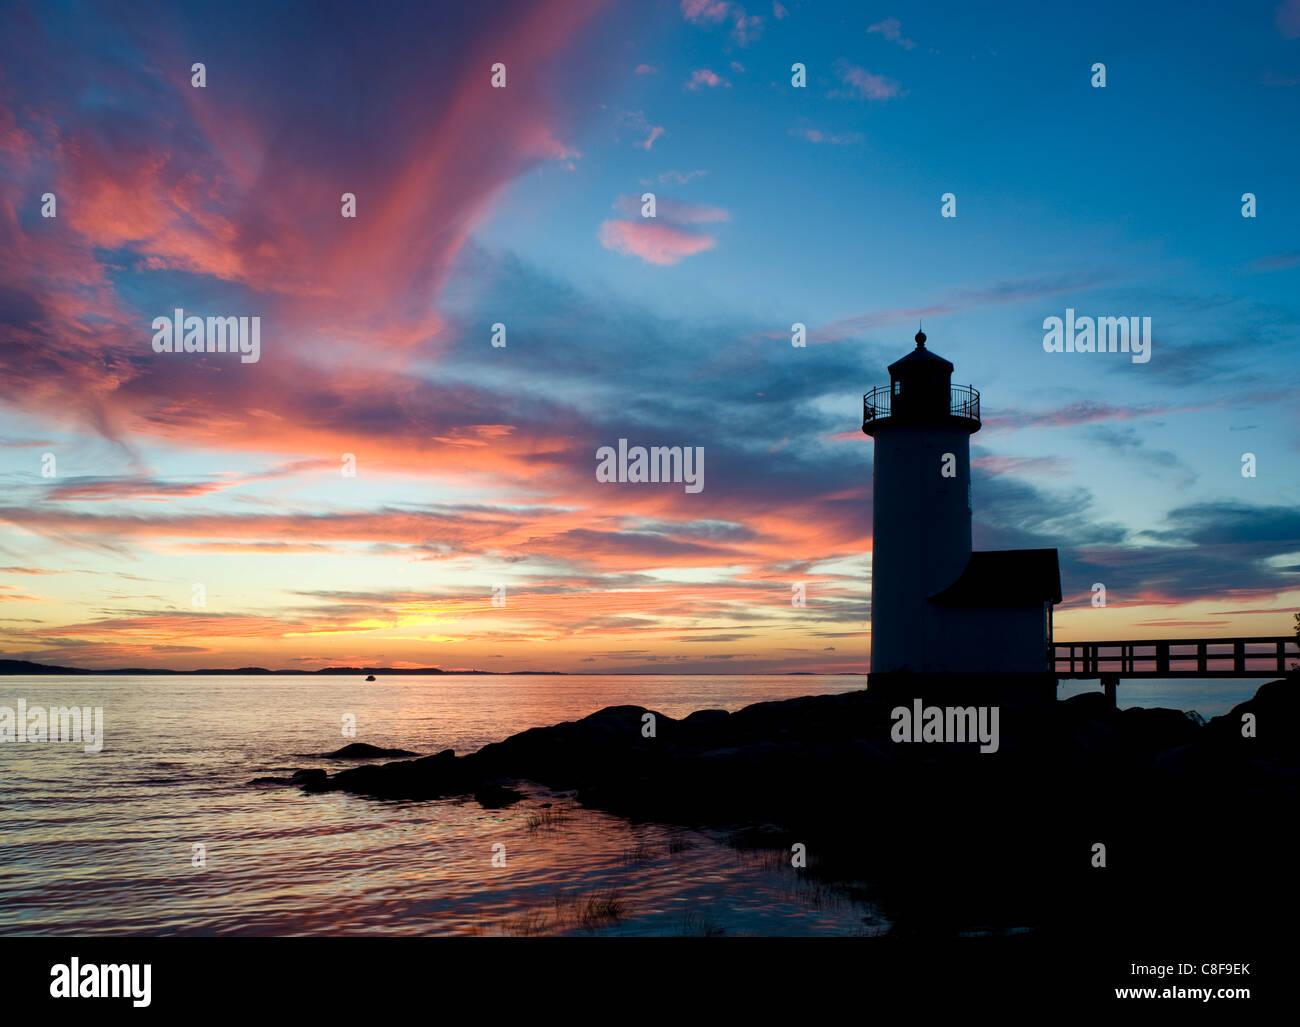 Silhouette of the Annisquam lighthouse at sunset, Annisquam near Rockport, Massachussetts, New England, USA - Stock Image